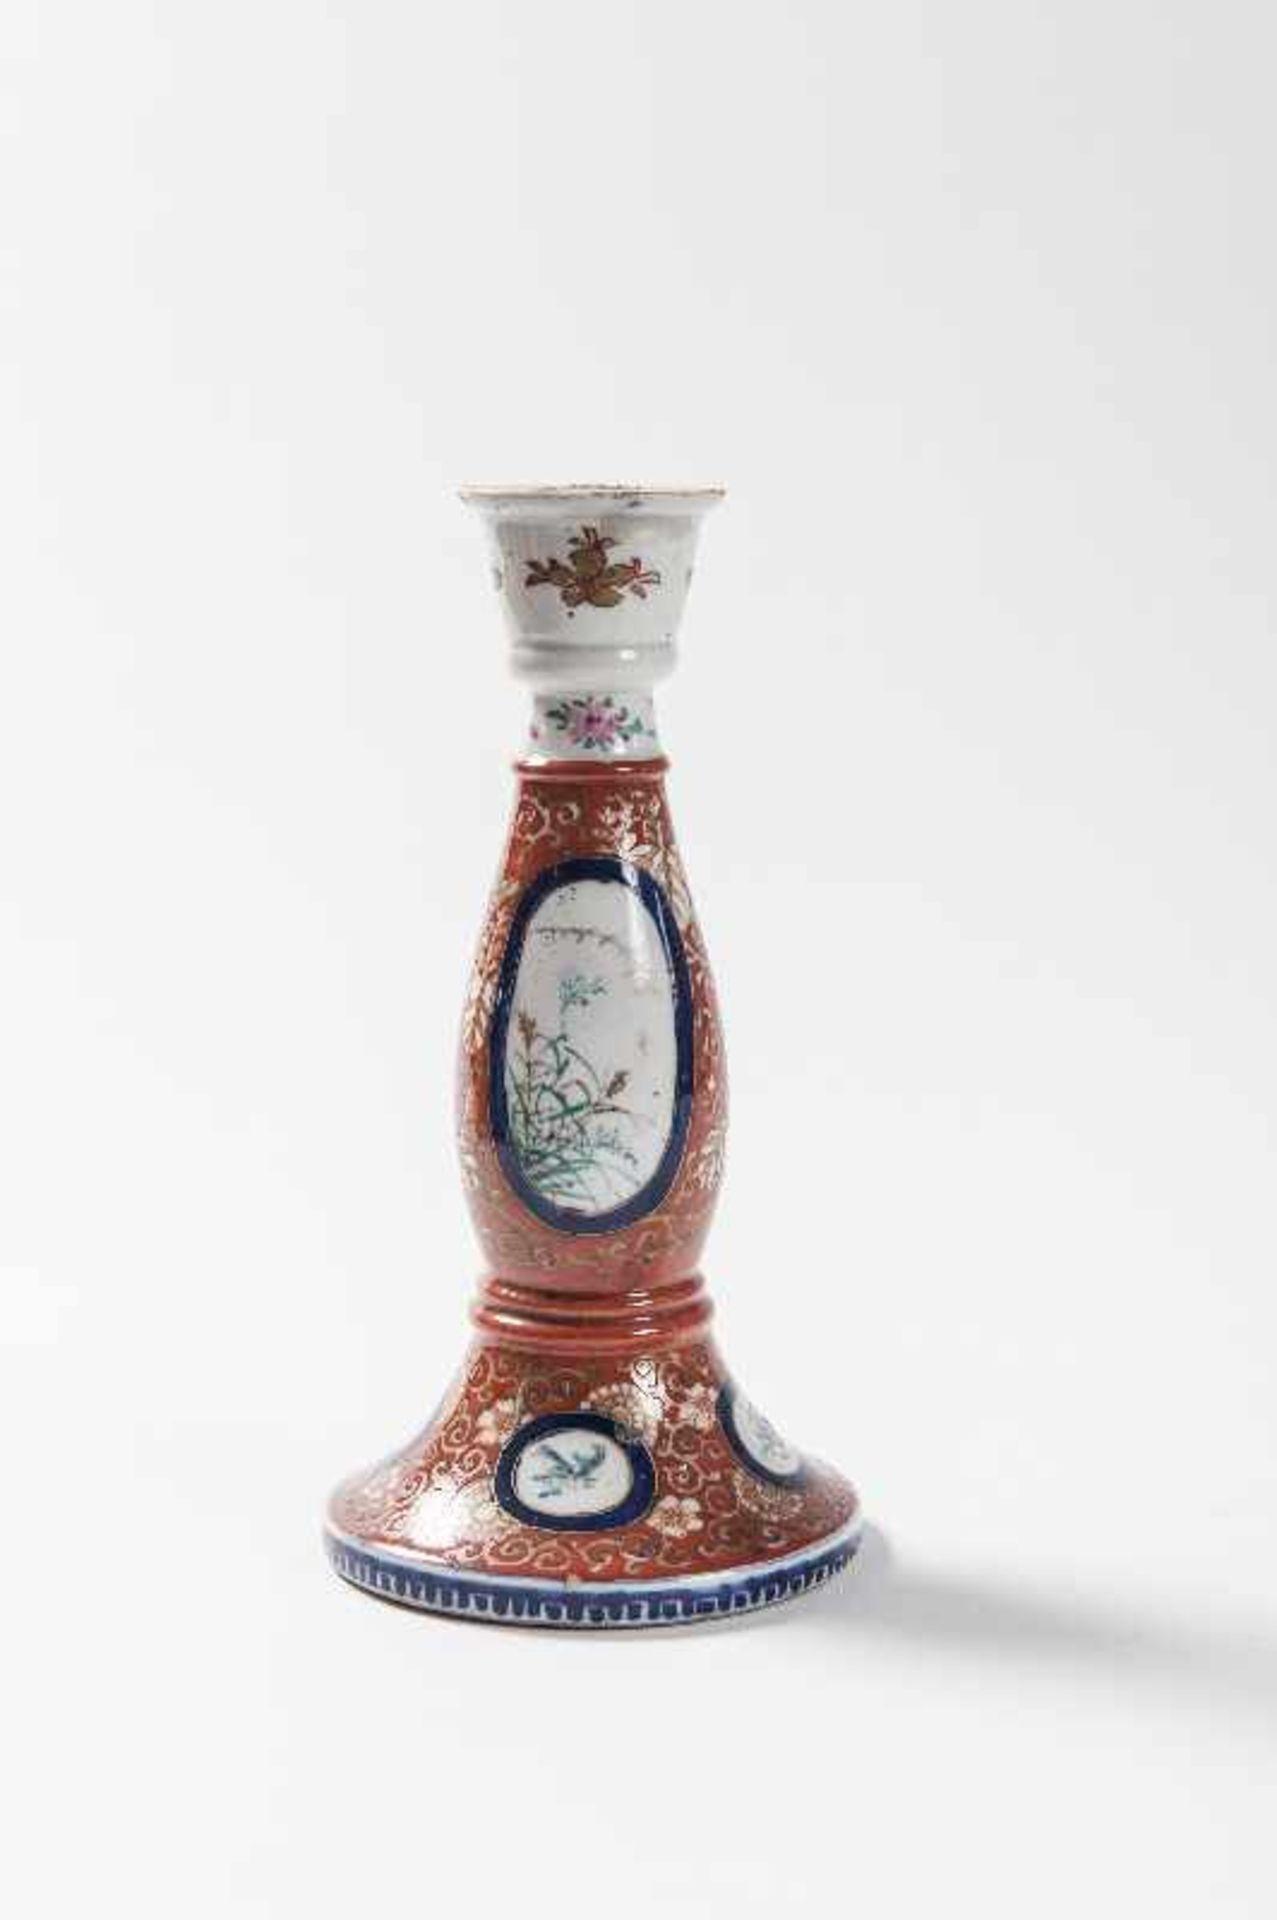 Konvolut Bestehend aus 1 Kerzenständer,1 Porzellanvase Kutani-Porzellan. Japan, 19. Jh. a) - Image 2 of 5